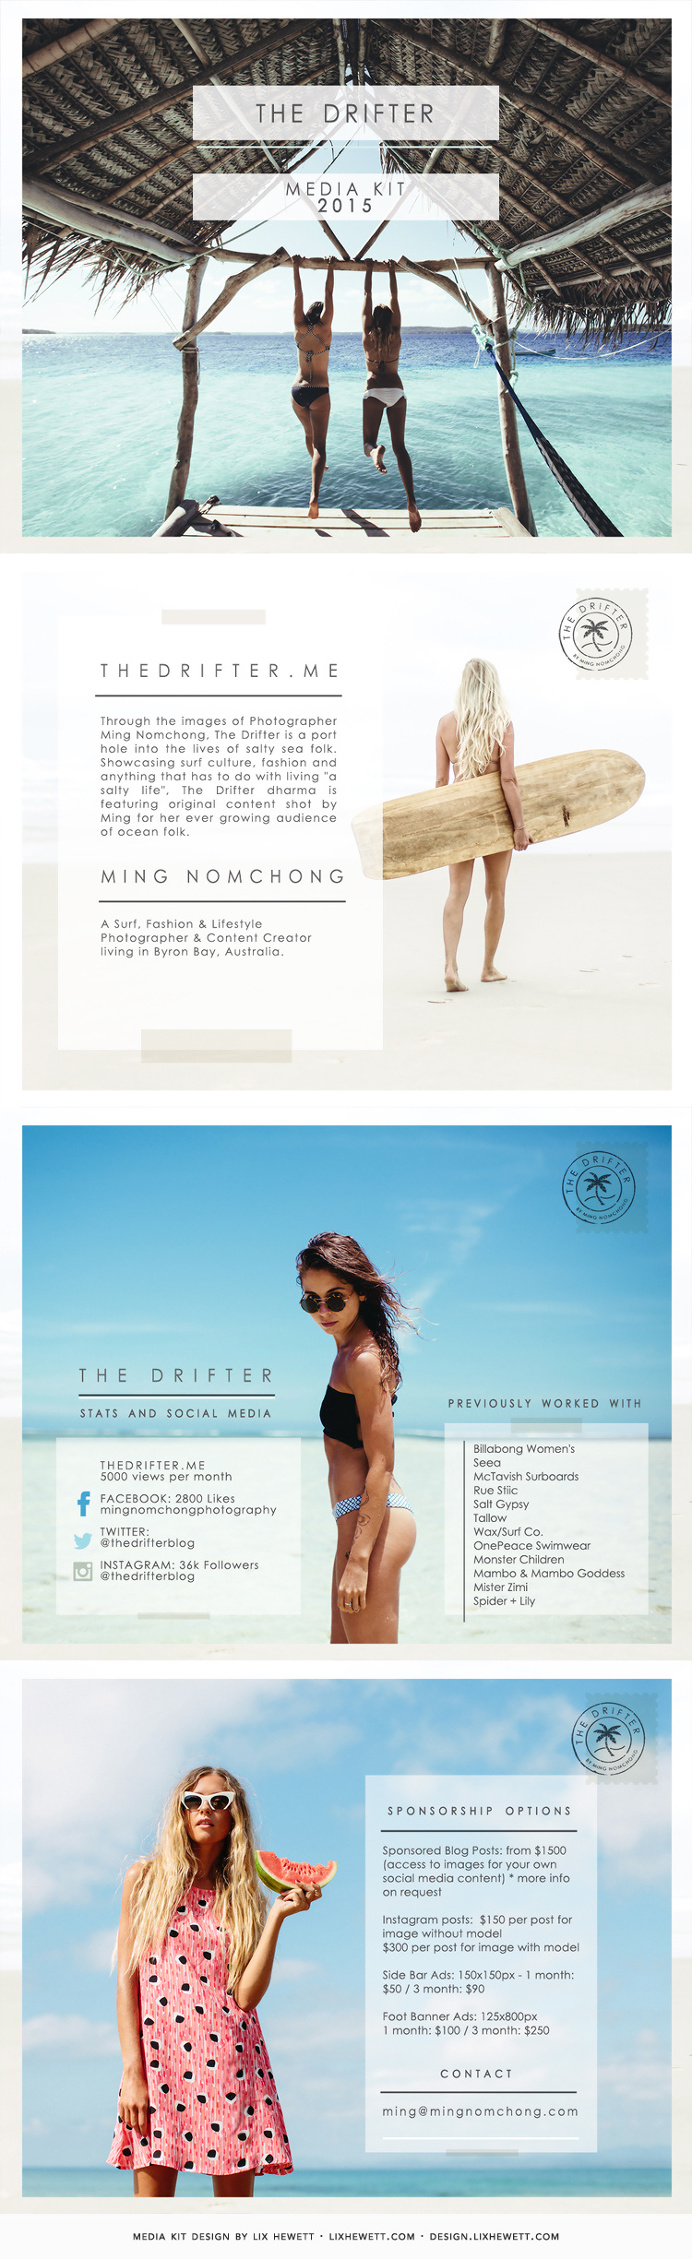 Travel Blogger PDF Media Kit Design